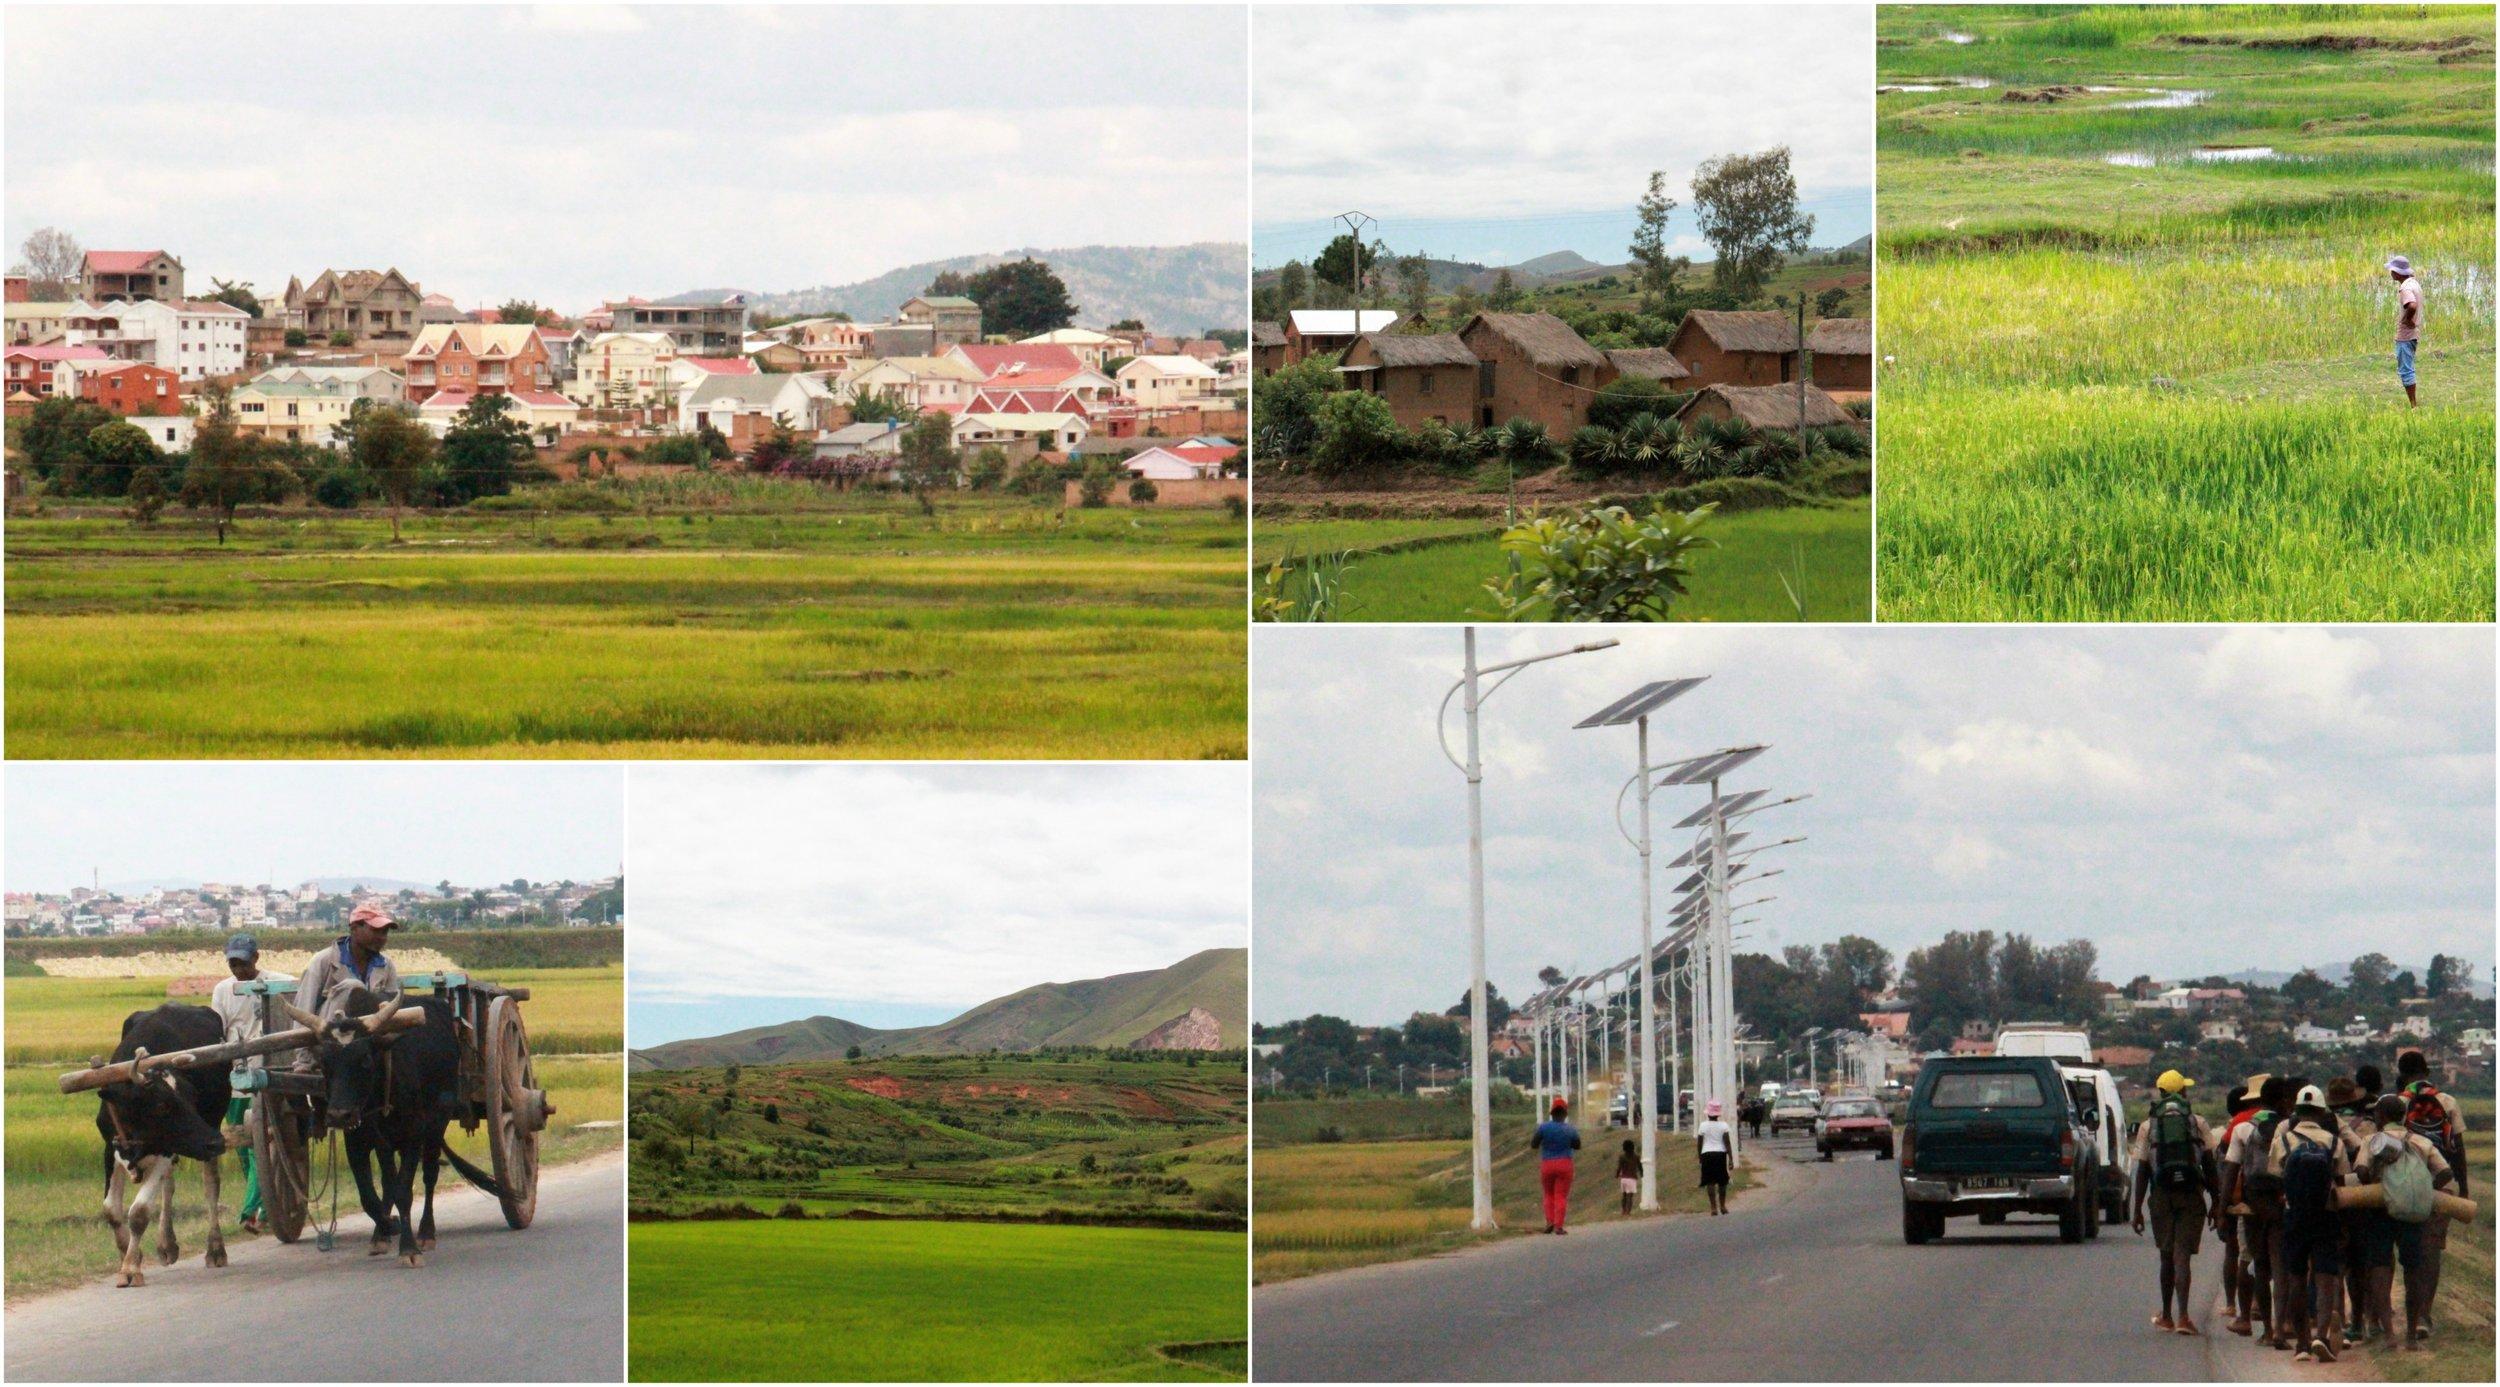 On the way from Ampefy to Antananarivo